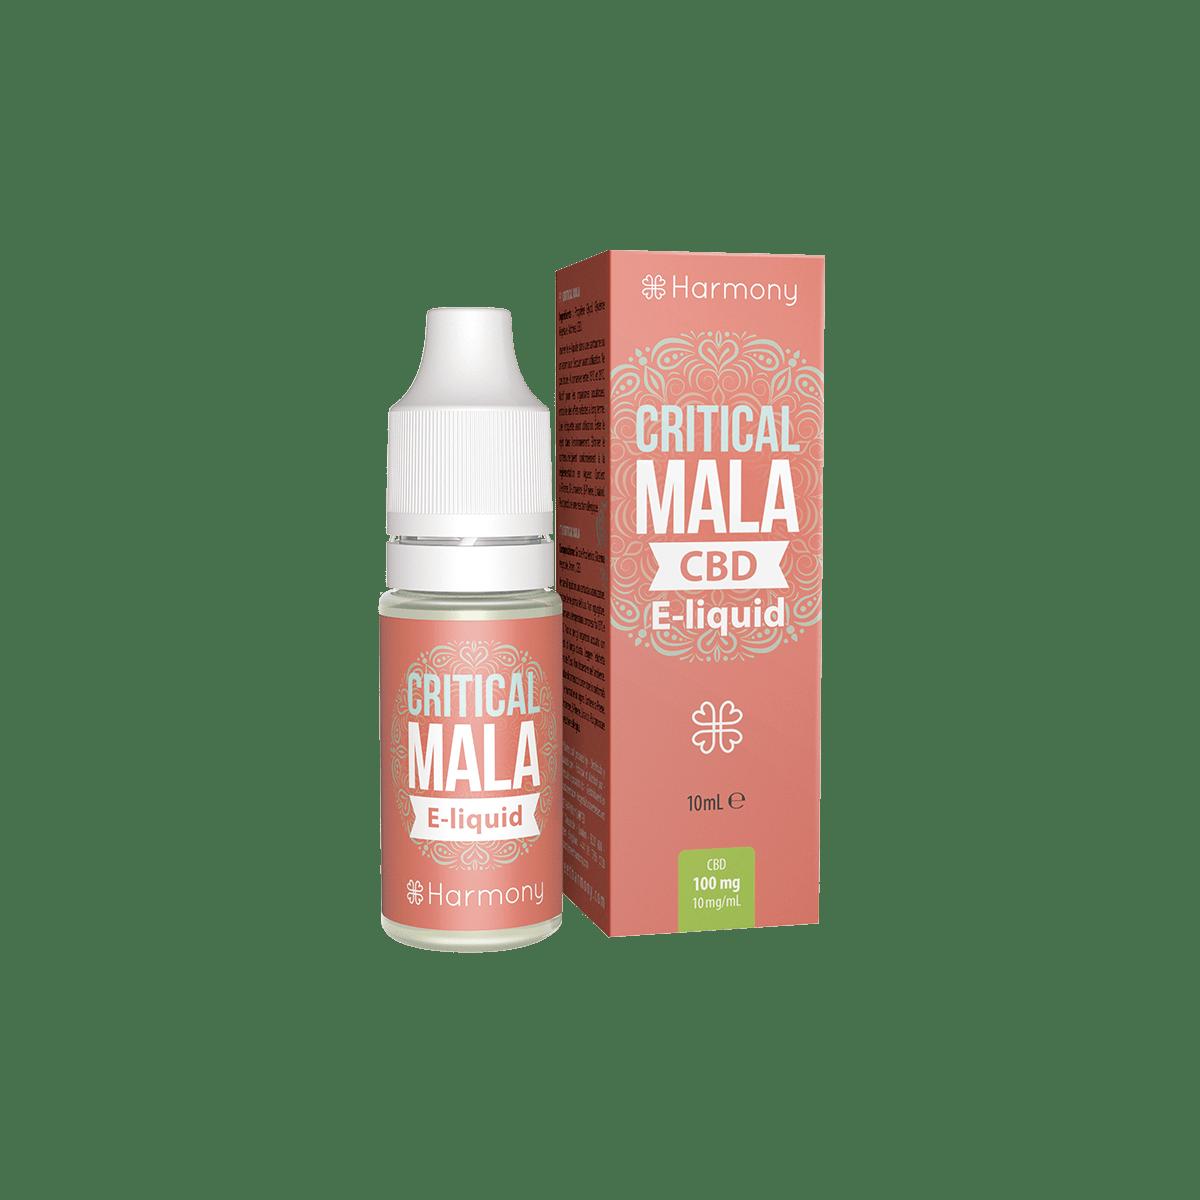 CBD Liquid | HARMONY Critical Mala | Menge 10 ml - 300 mg im Preisvergleich